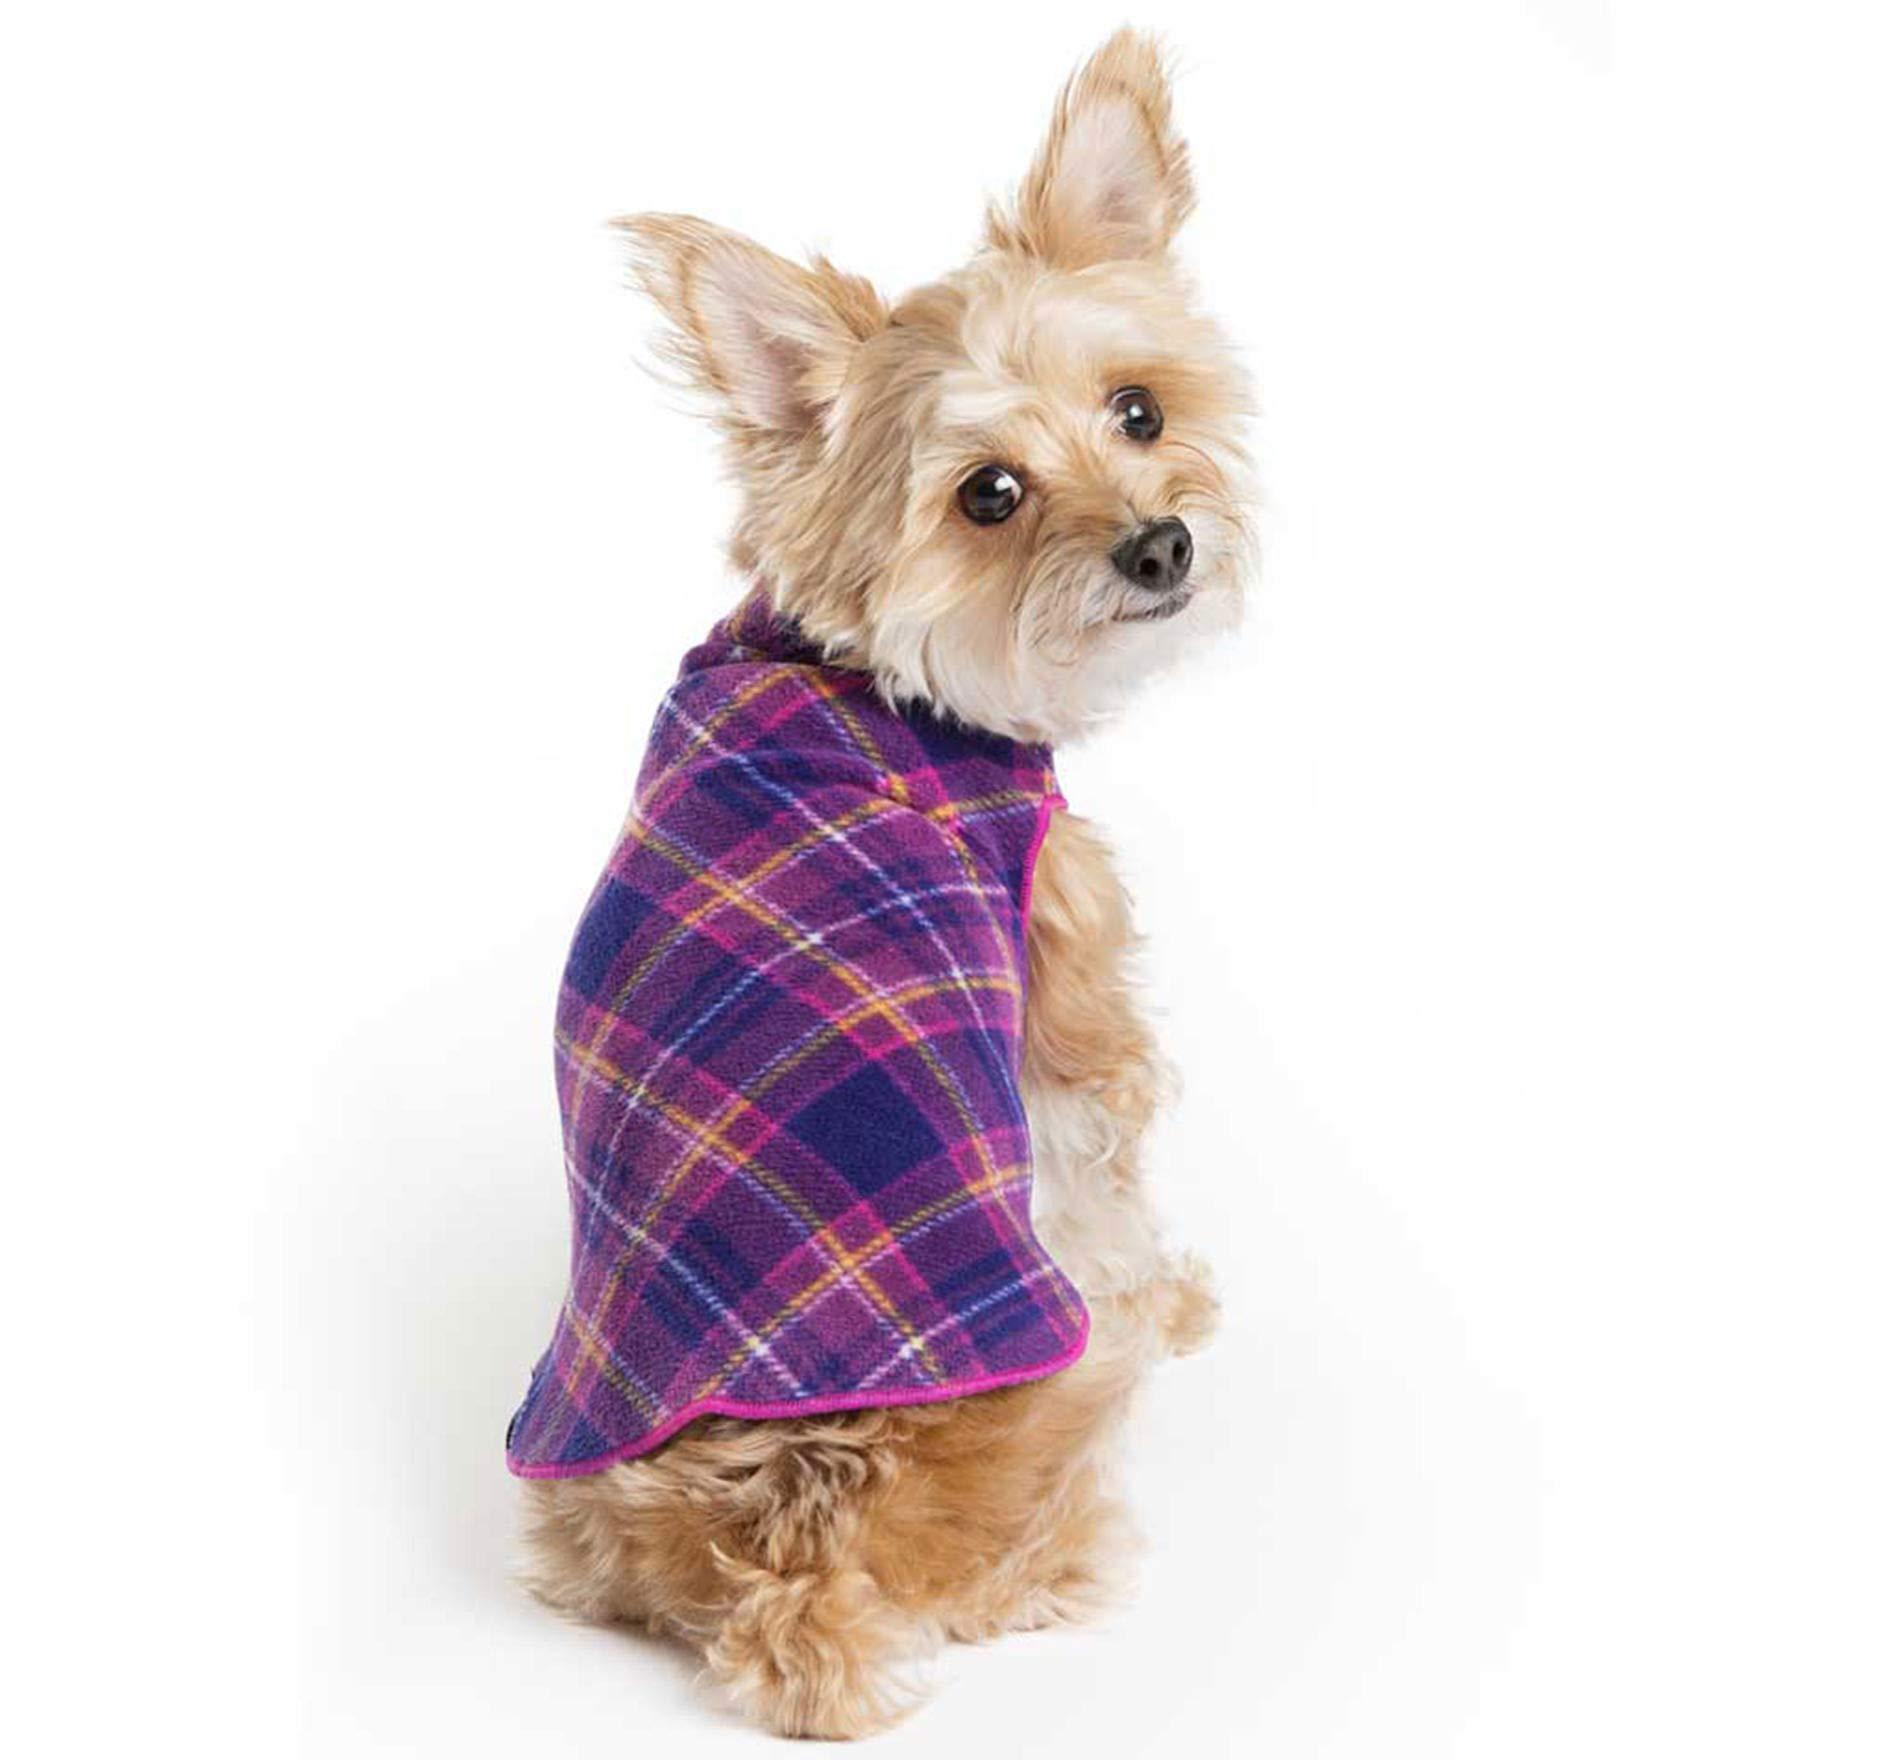 Gold Paw Stretch Fleece Dog Coat - Soft, Warm Dog Clothes, Stretchy Pet Sweater - Machine Washable, Eco Friendly - All Season - Sizes 2-33, Mulberry Plaid, Size 16